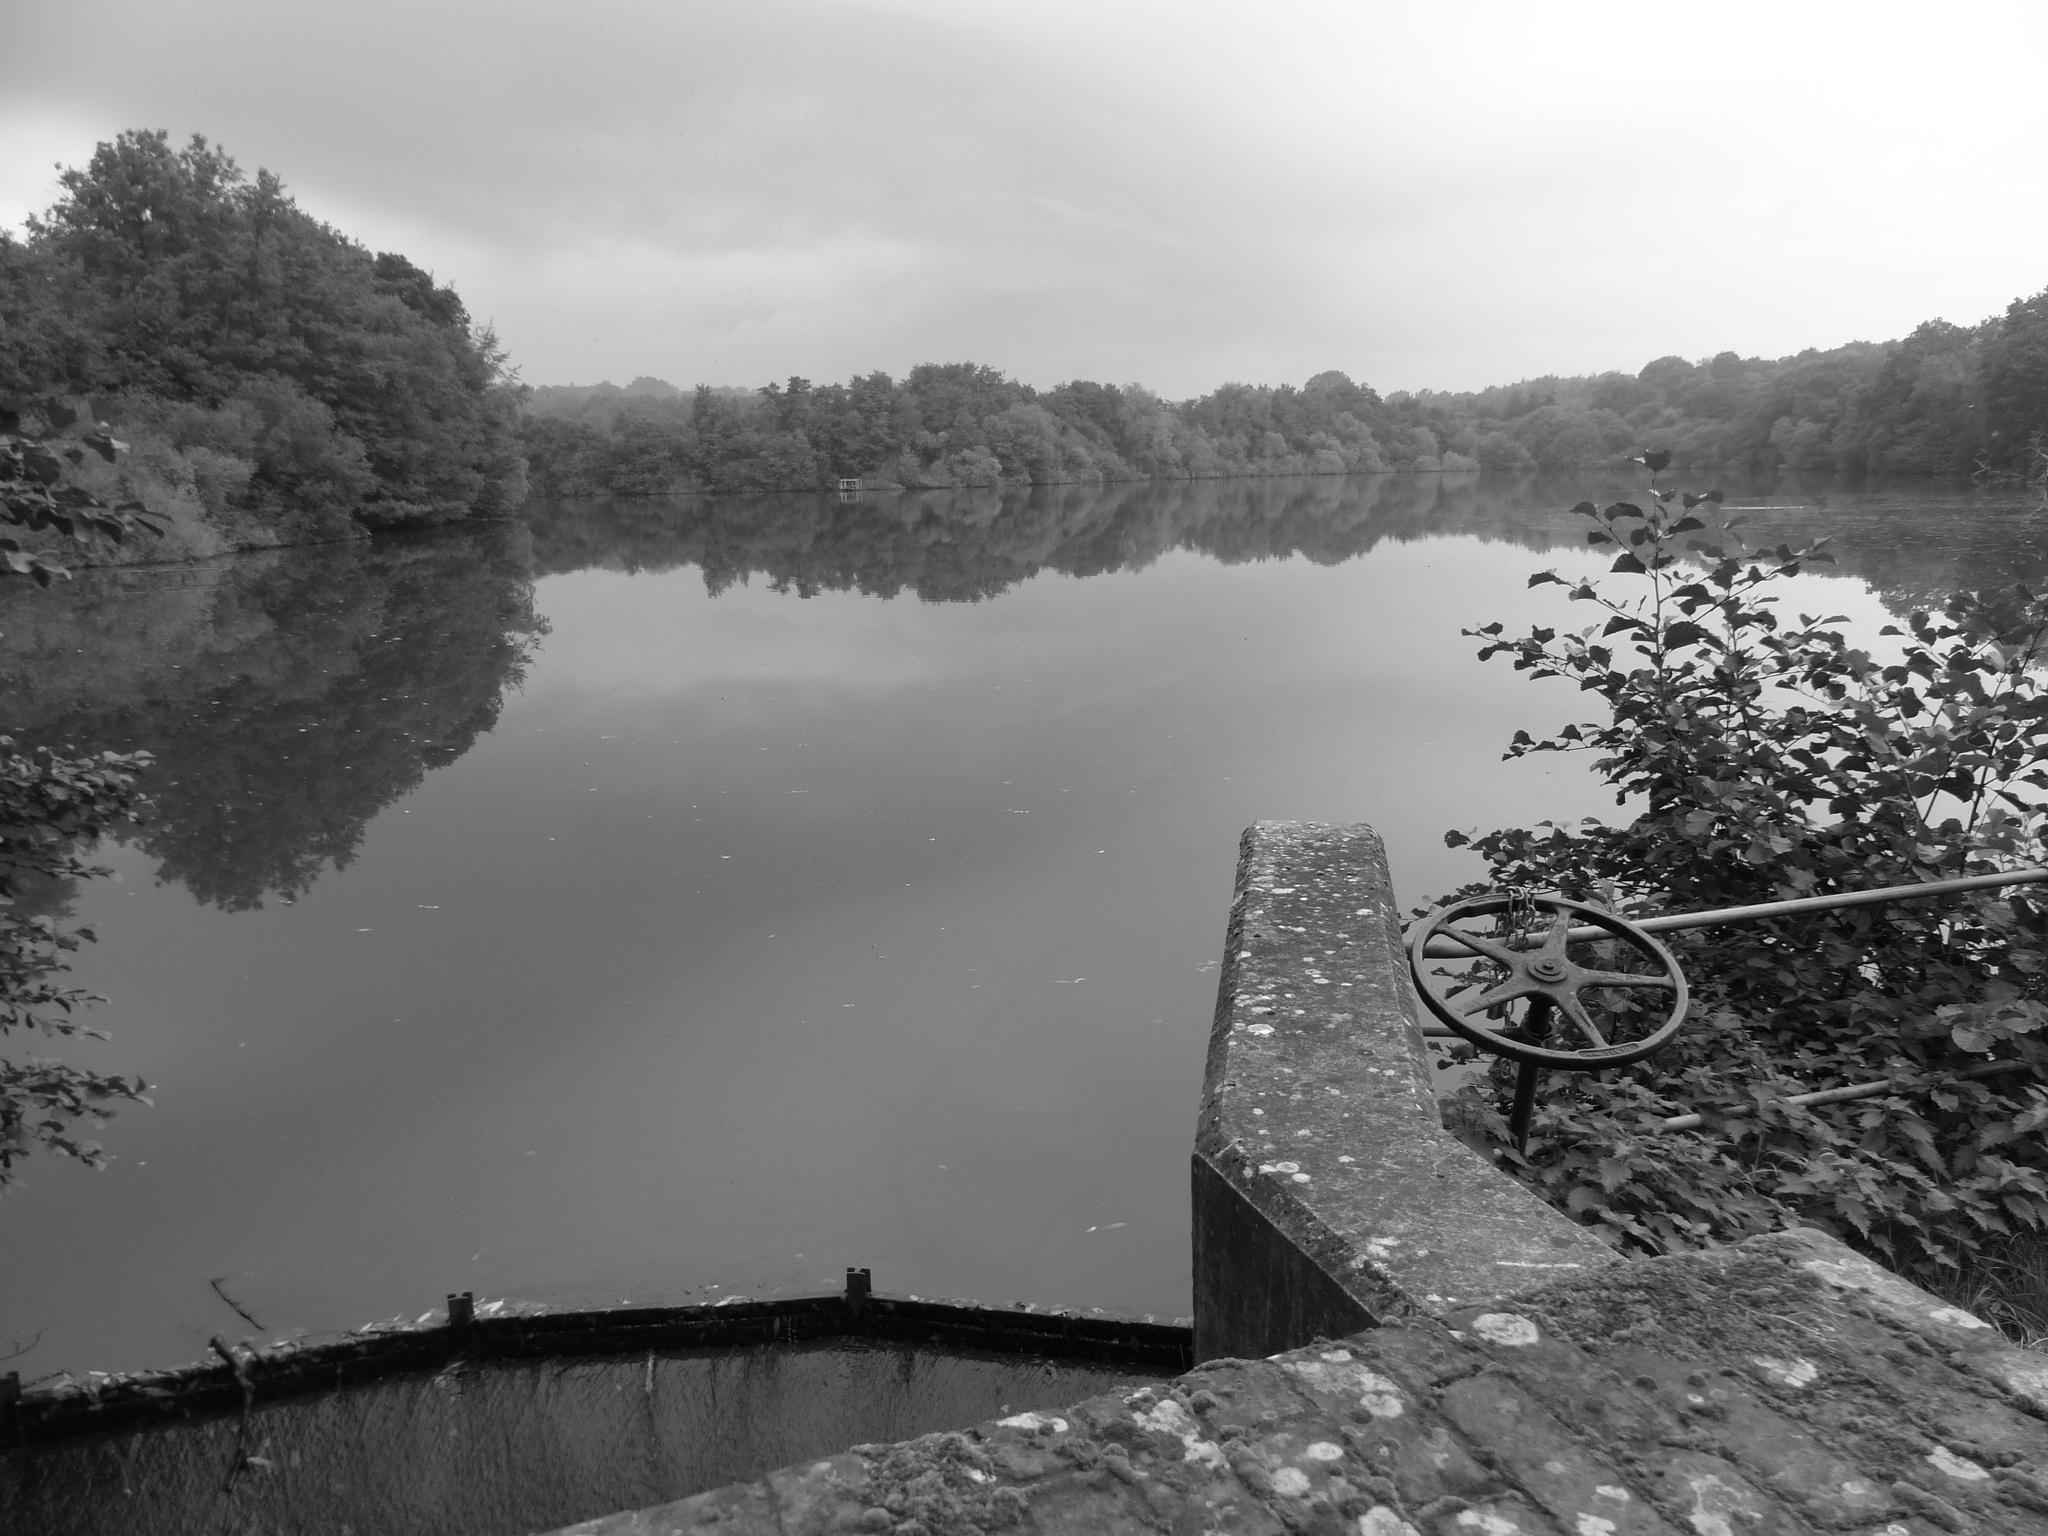 #Lake #Balcombe #WestSussex #BlackAndWhite by Malc Thomason